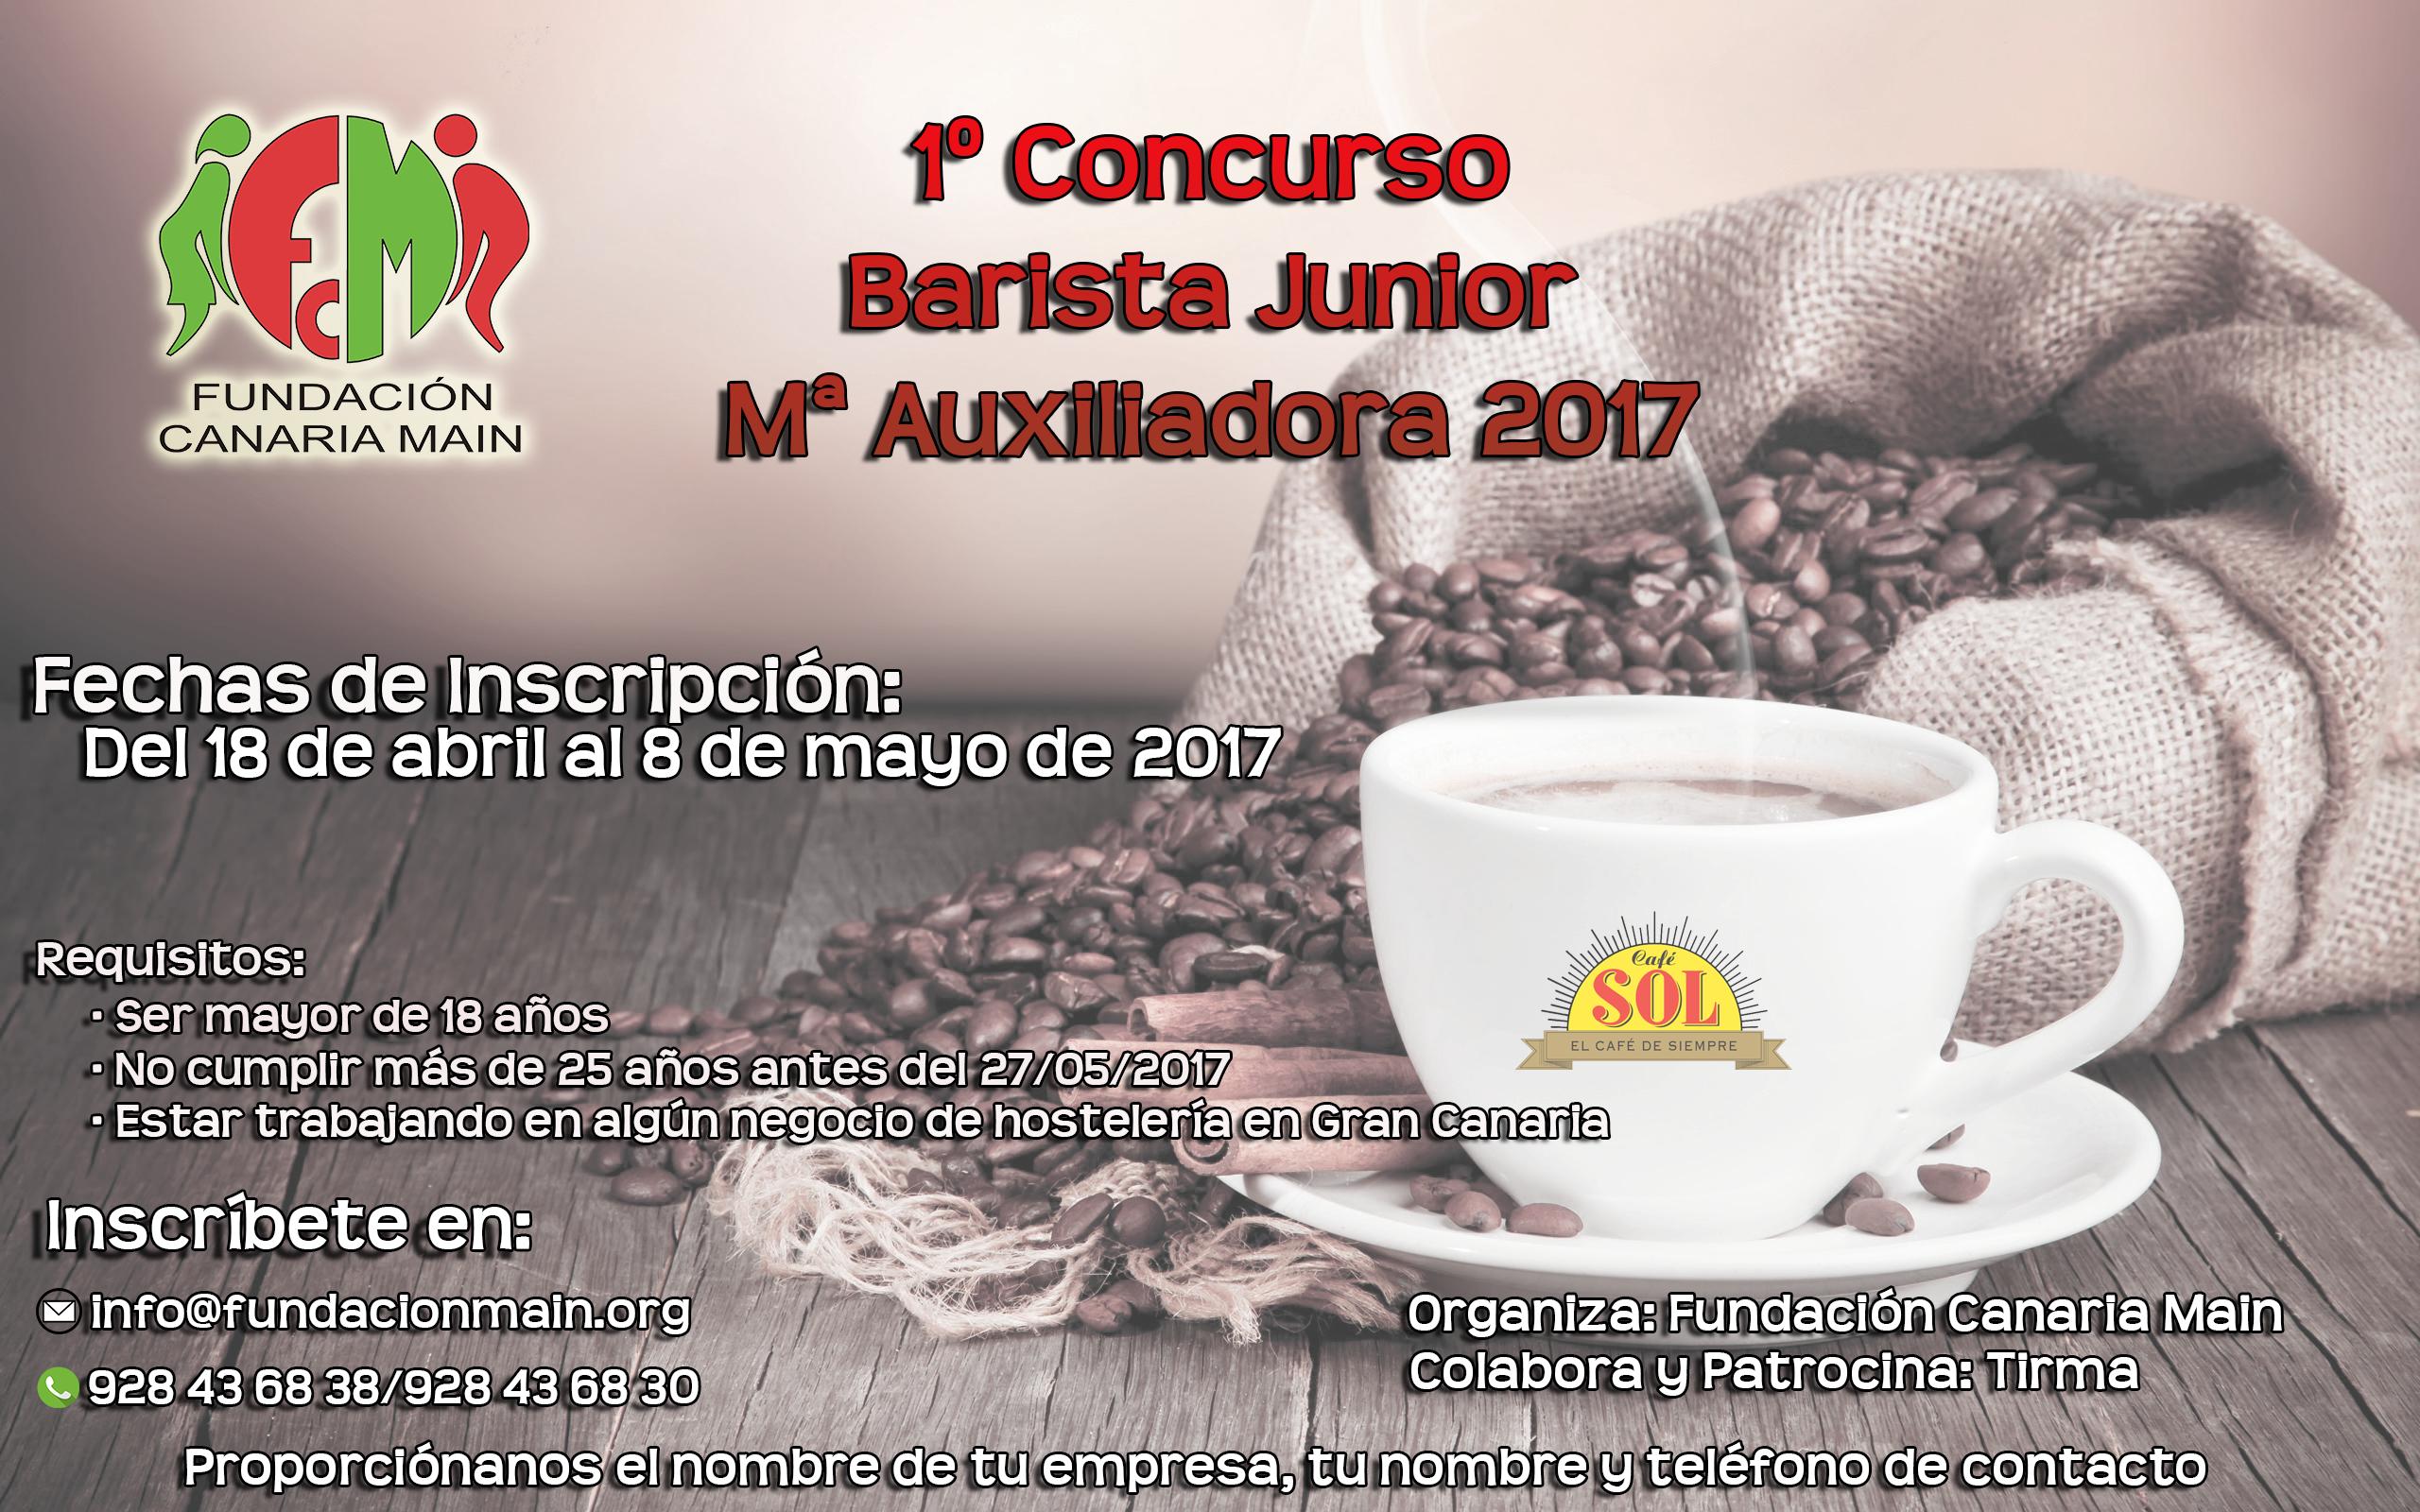 Primer Concurso Barista Junior Mª Auxiliadora 2017